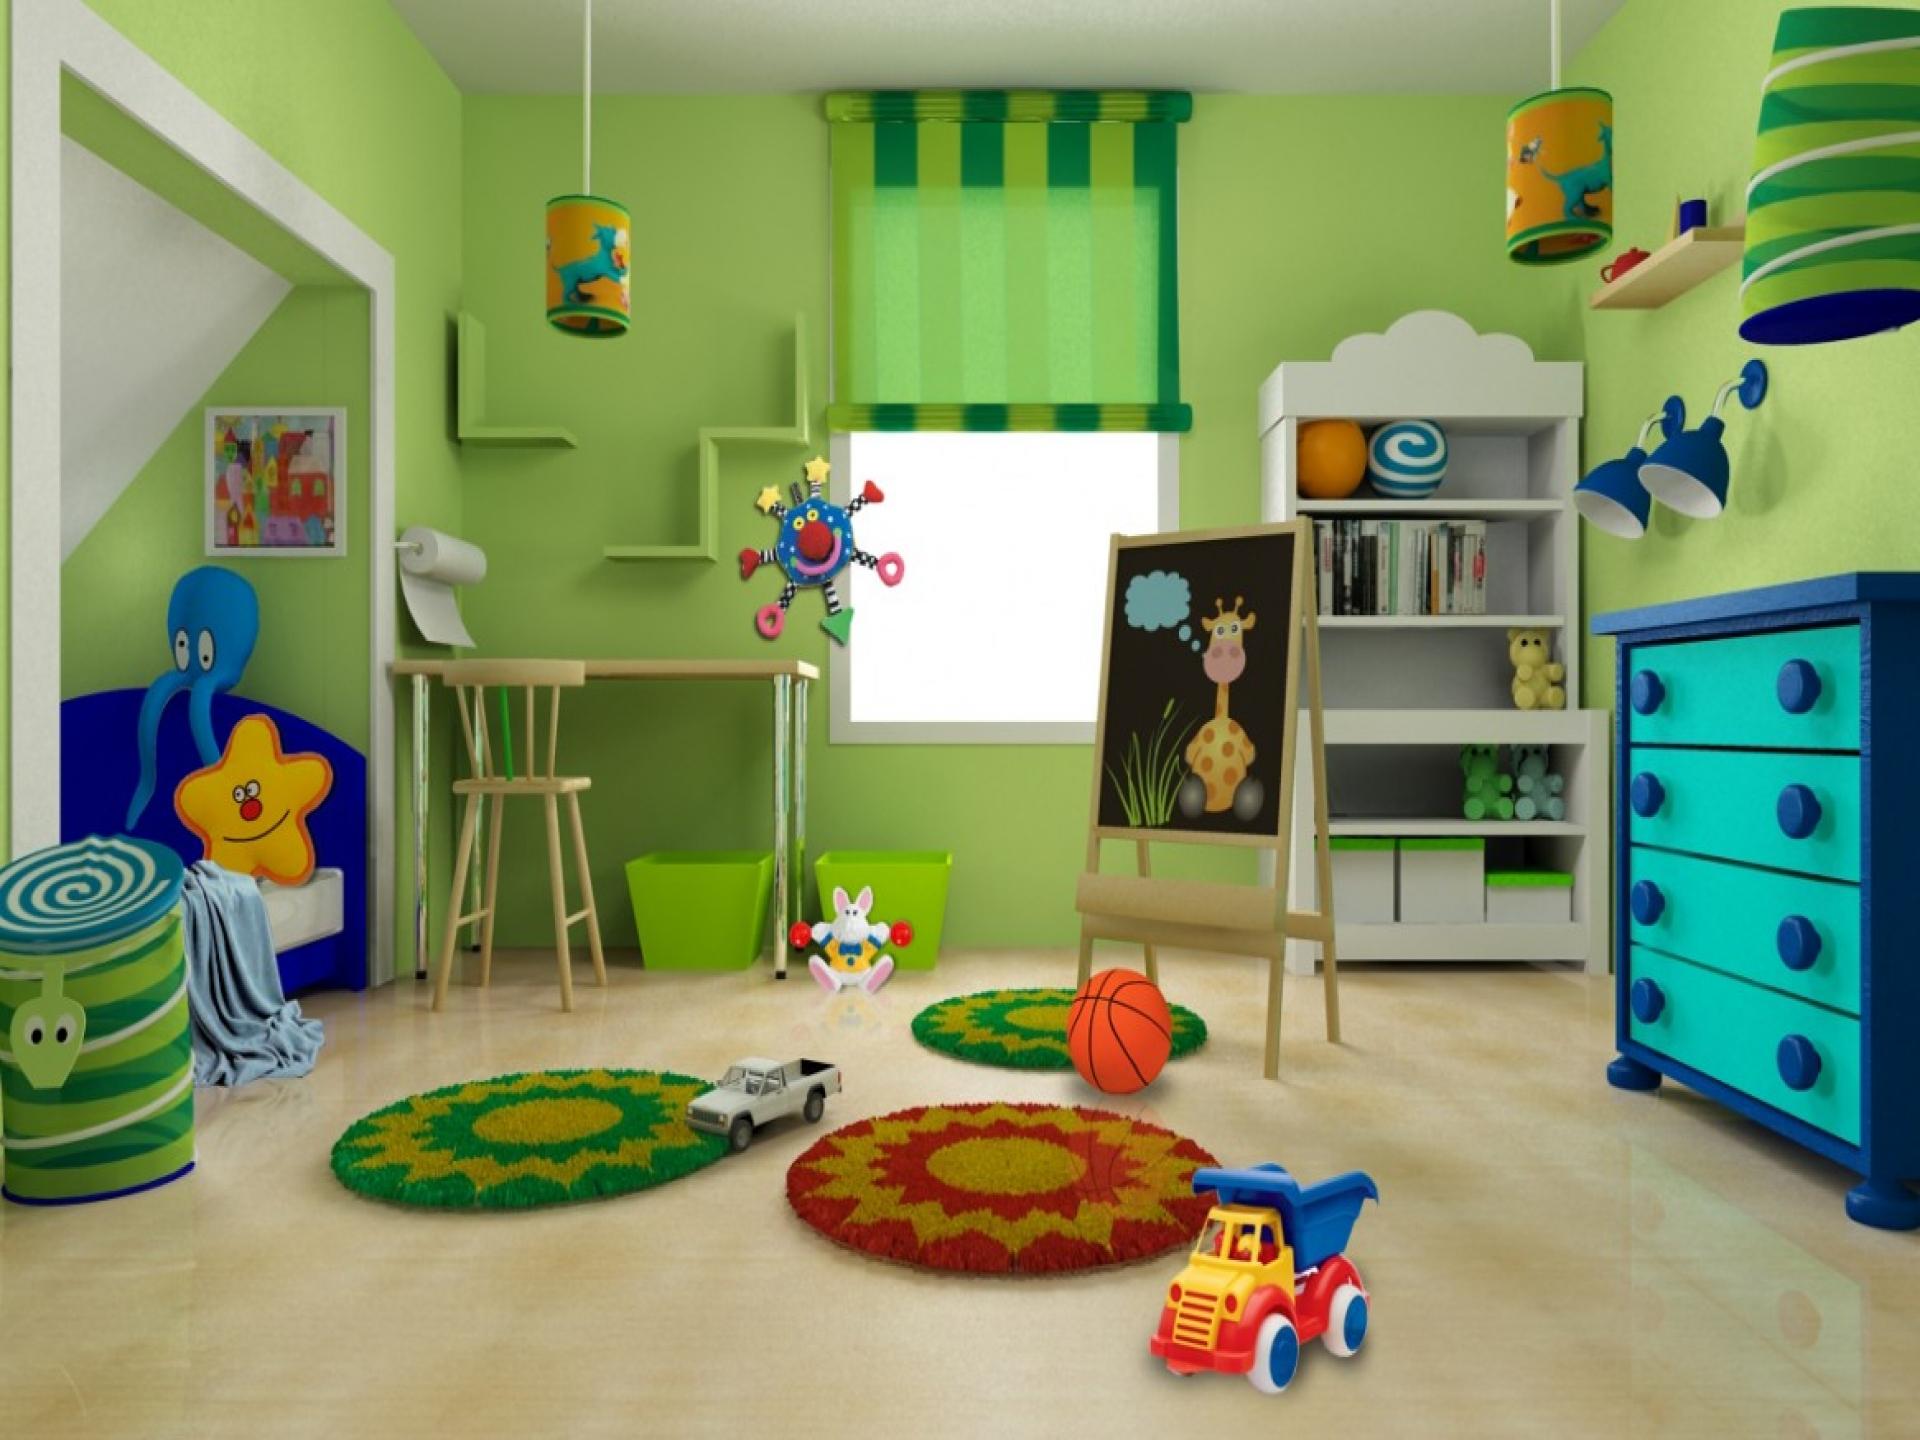 Decorate & Design Ideas For Kids Room